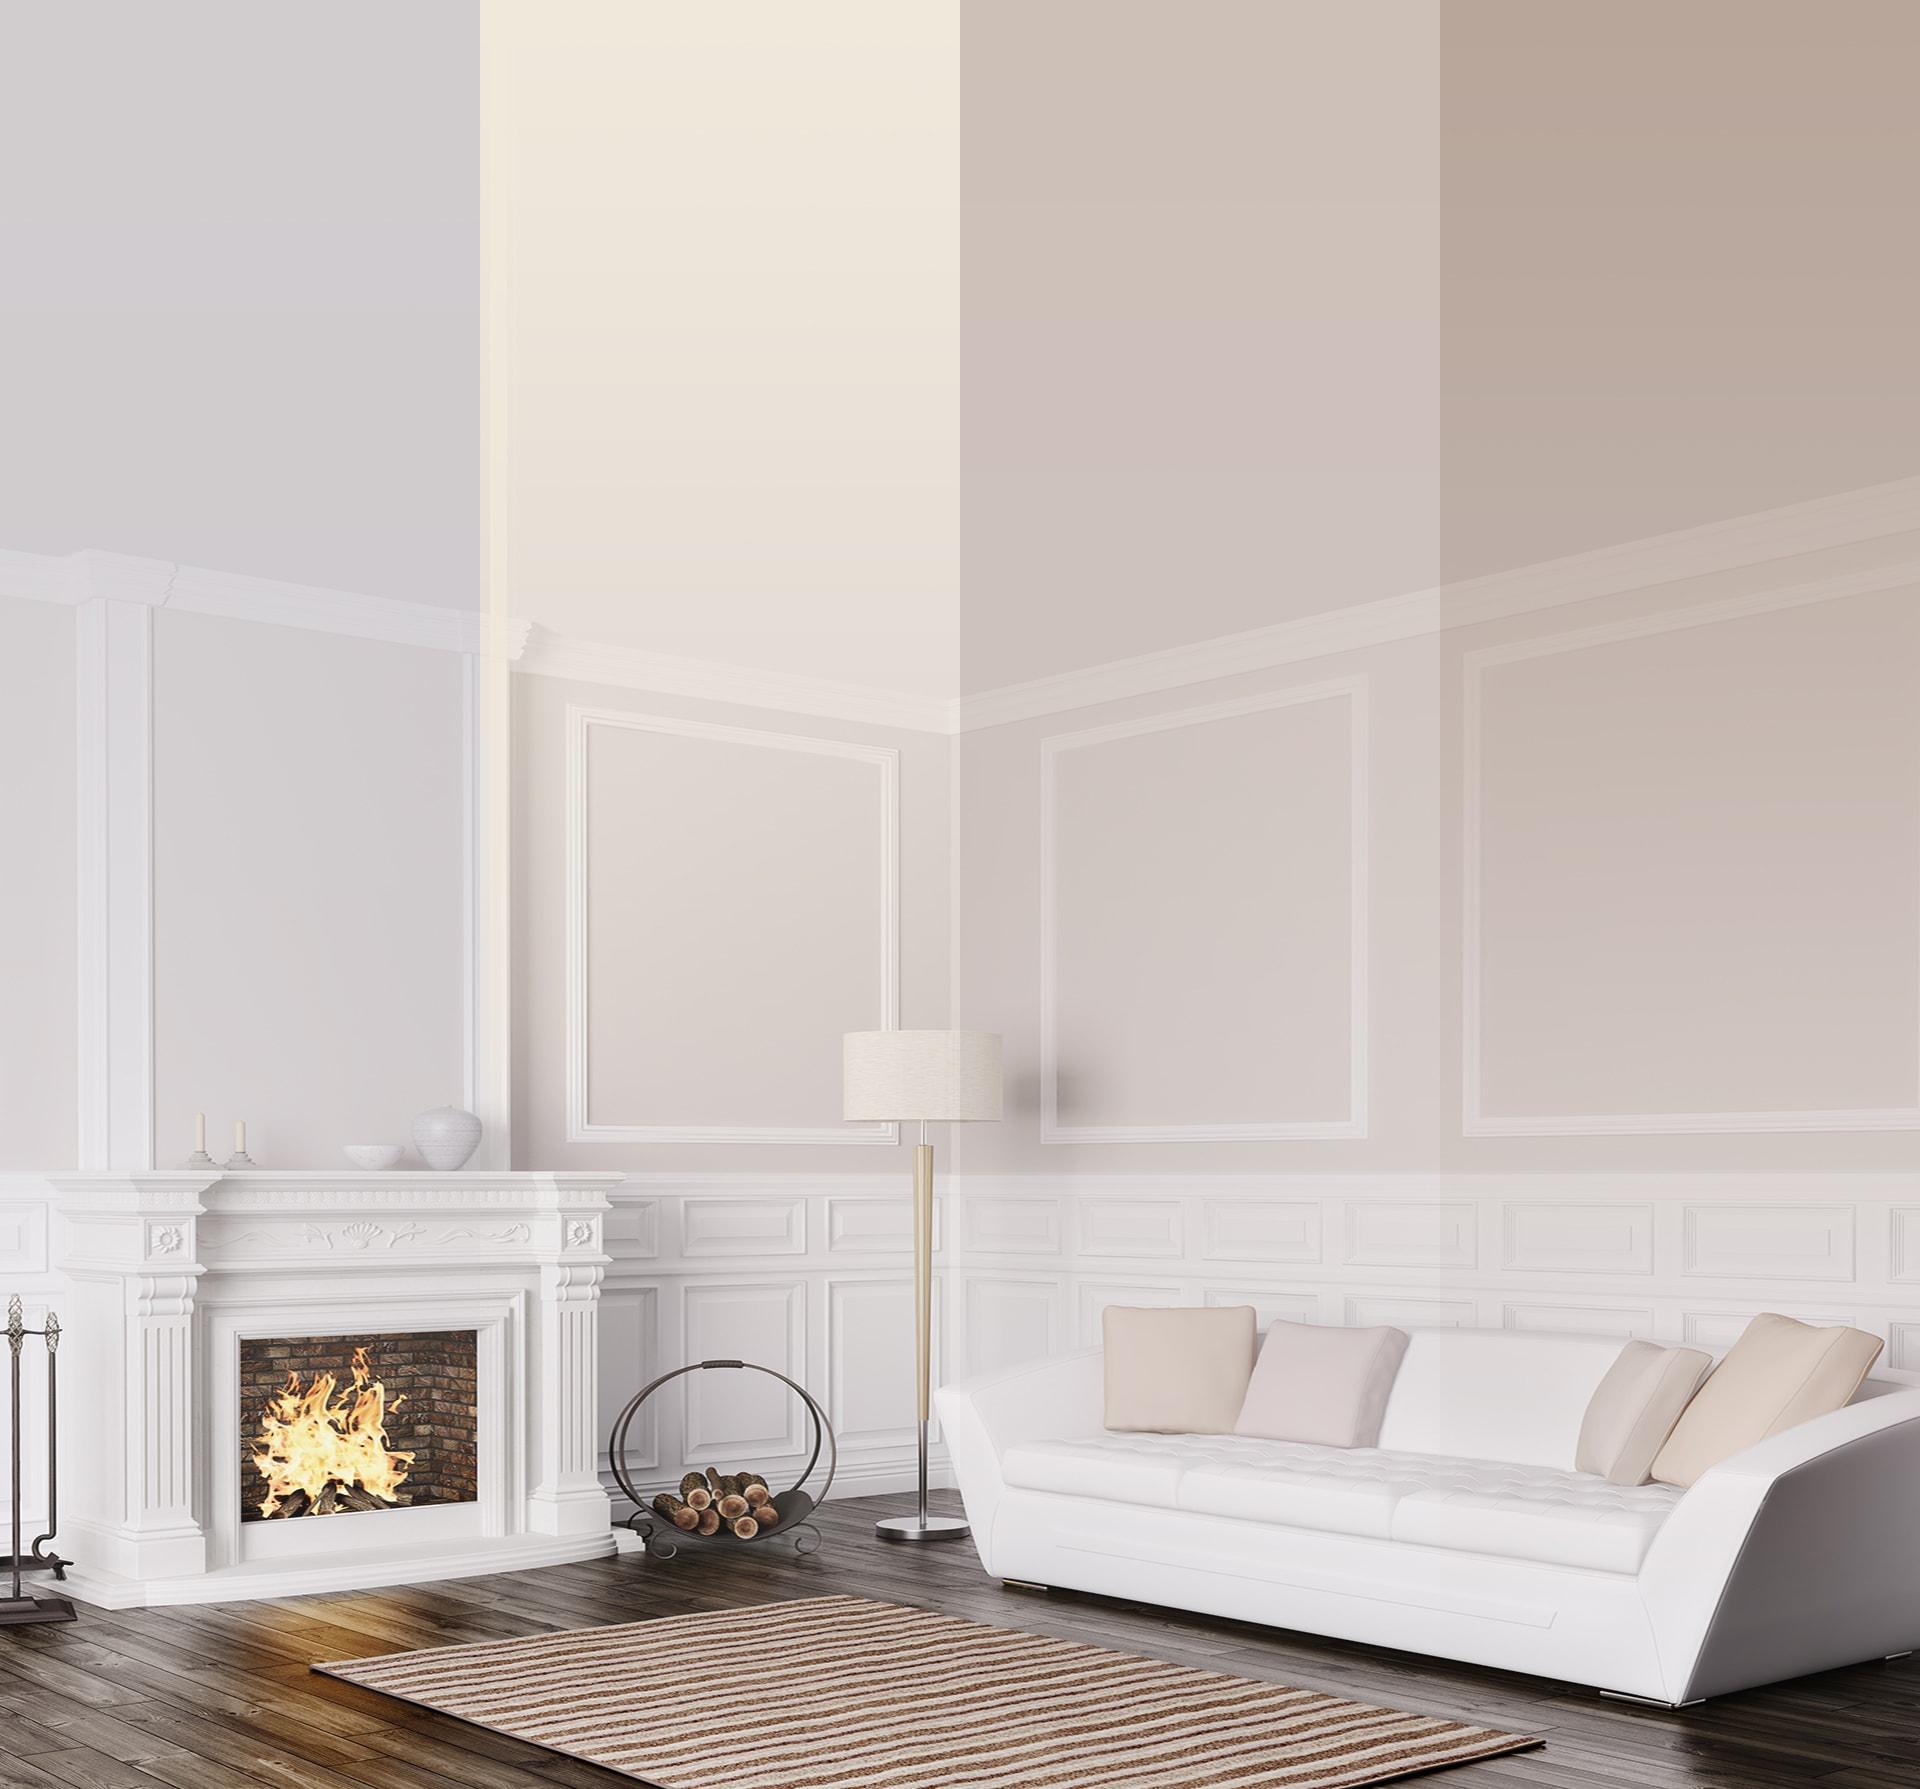 Stucchi Decorativi in Gesso per Interni - Pa.Ca. Srl